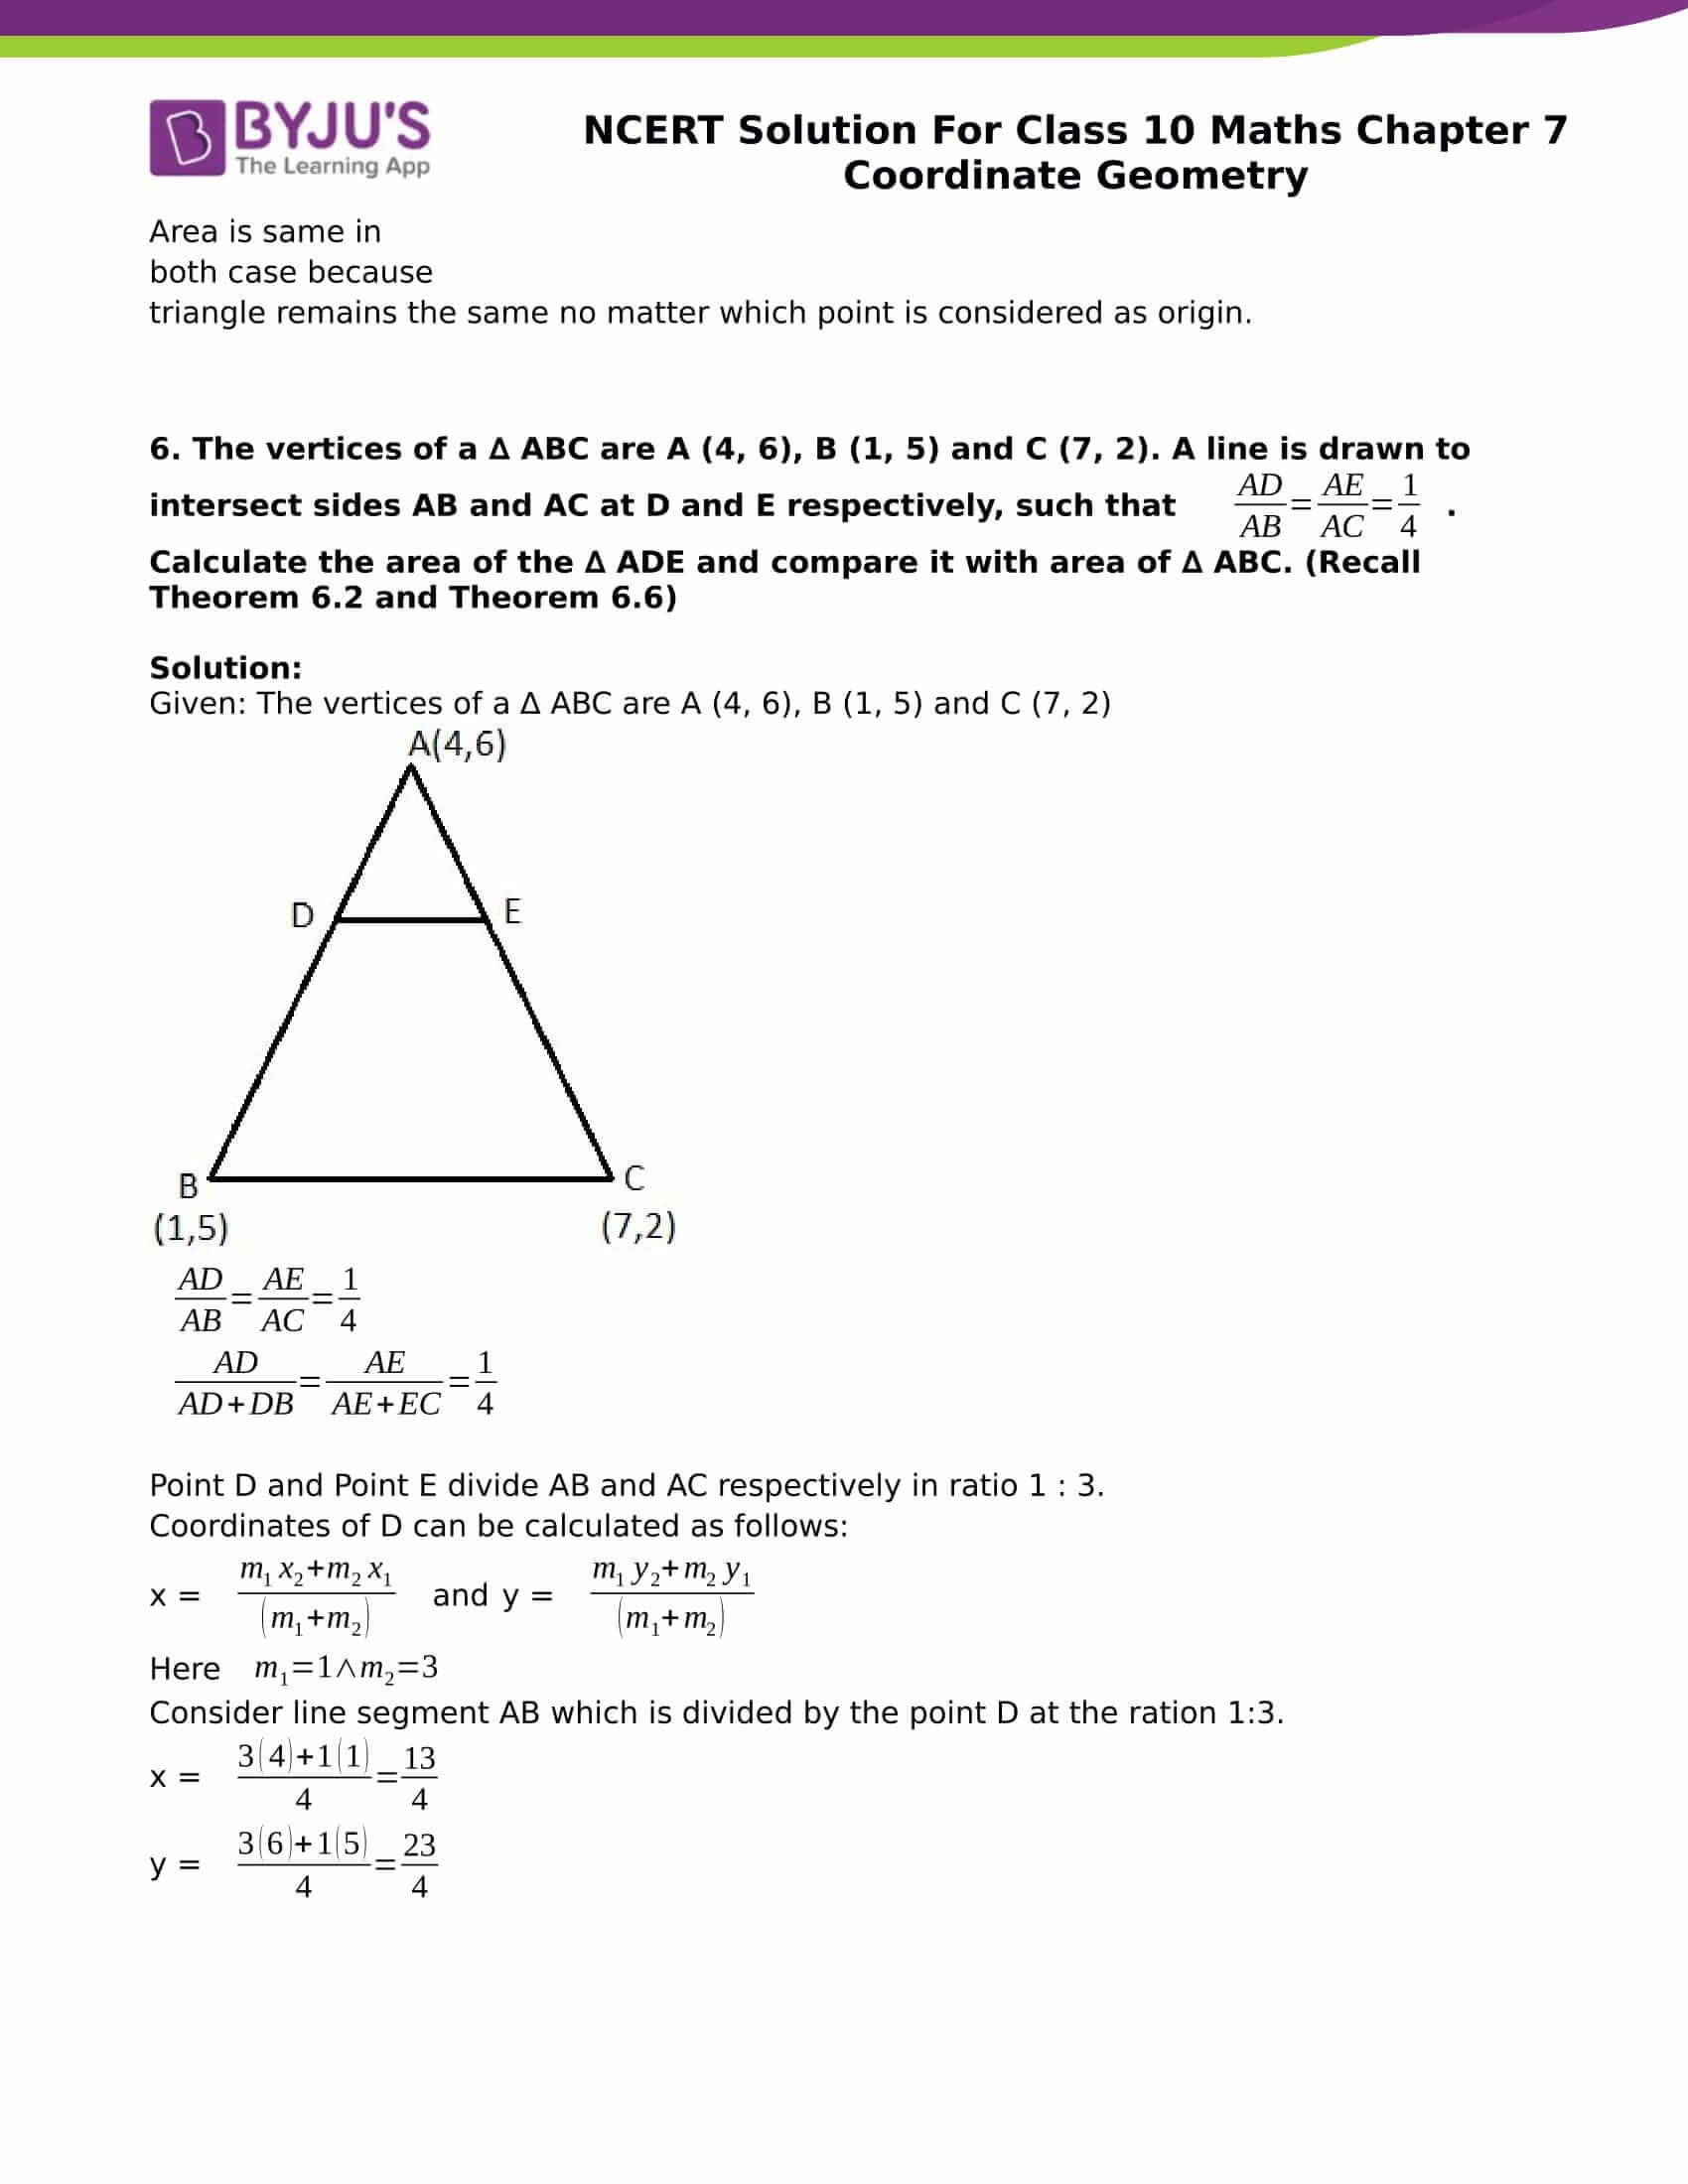 NCERT Solution for class 10 Maths chapter 7 Coordinate Geometry Part 27